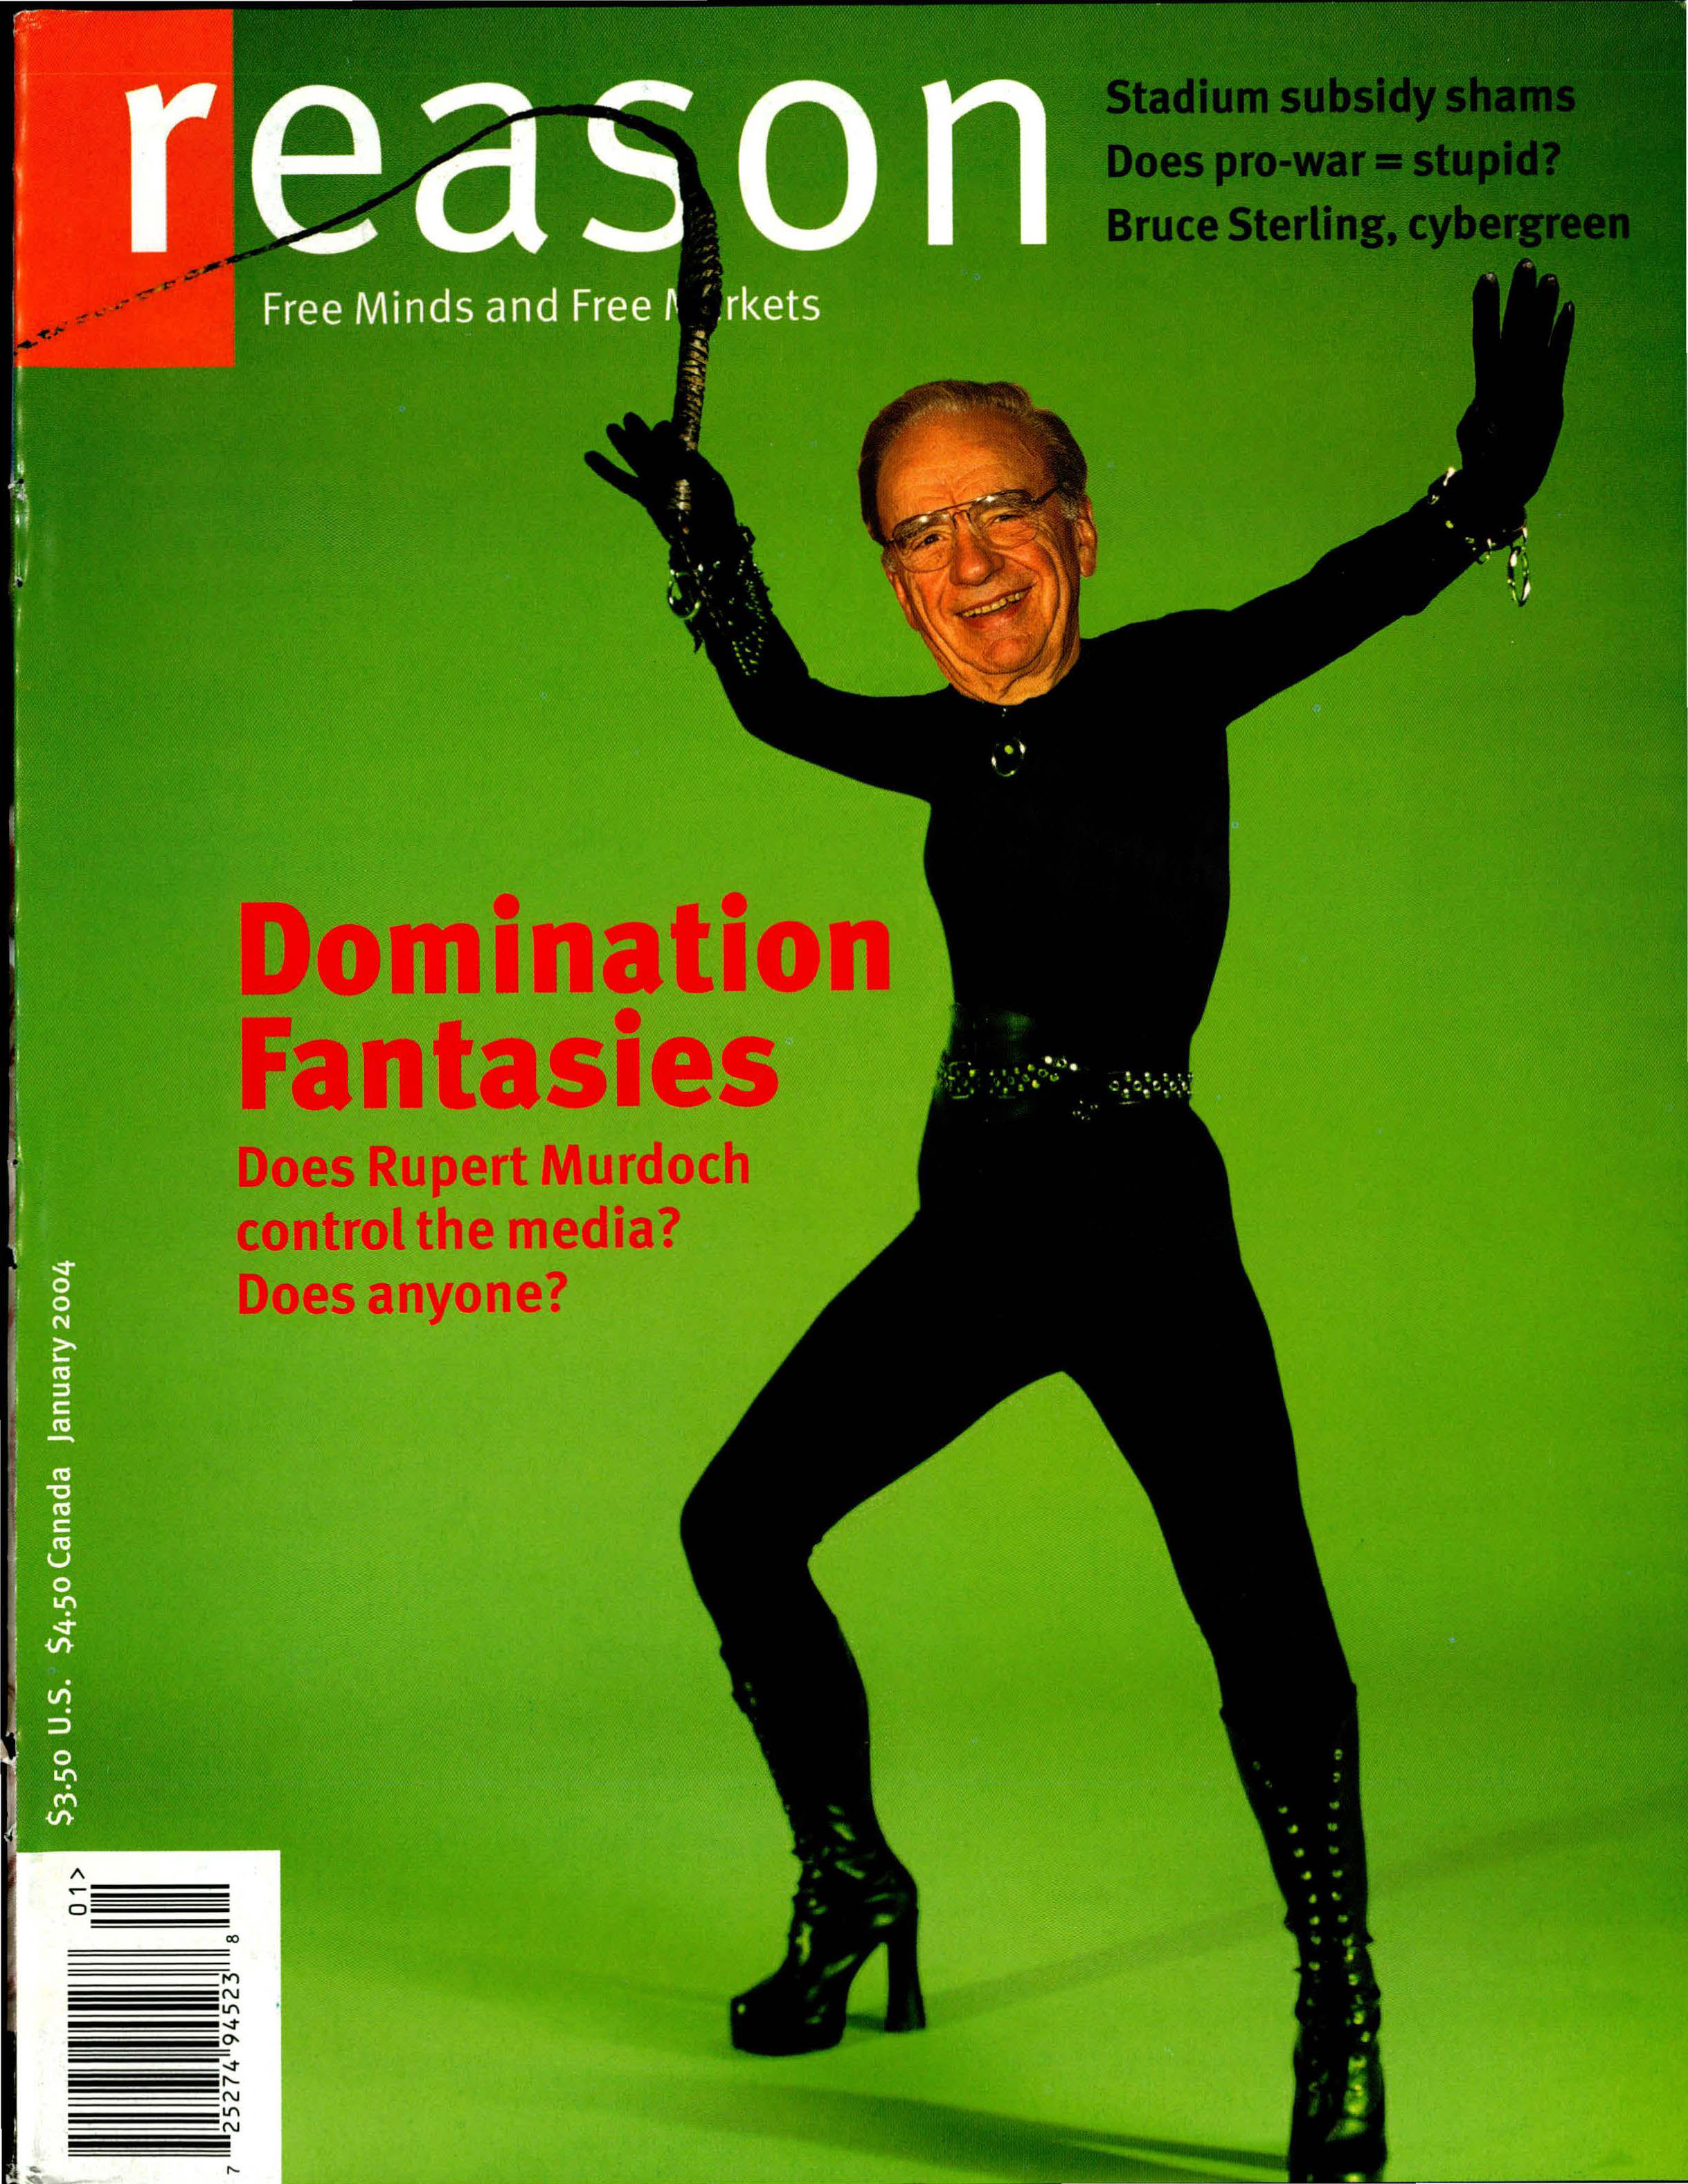 Reason Magazine, January 2004 cover image